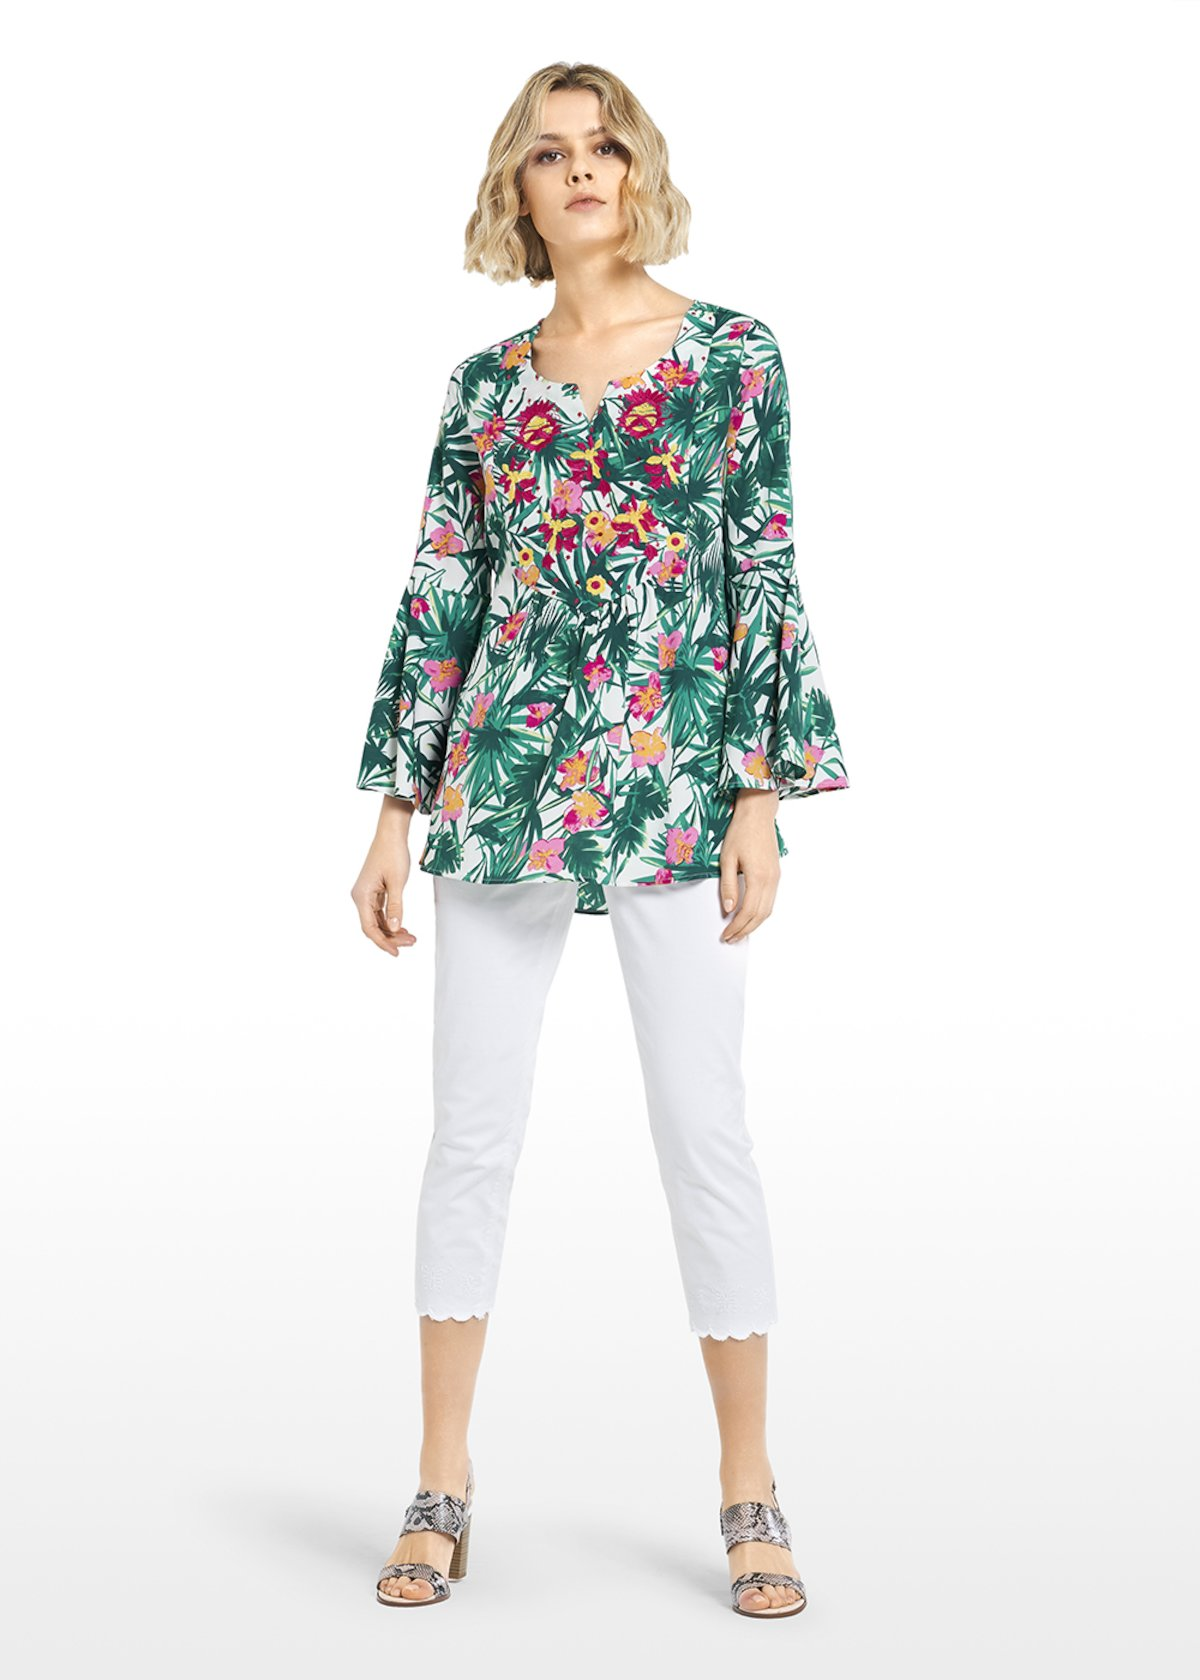 Consuelo blouse with embroidery on the front - White\ Amazon\ Fantasia - Woman